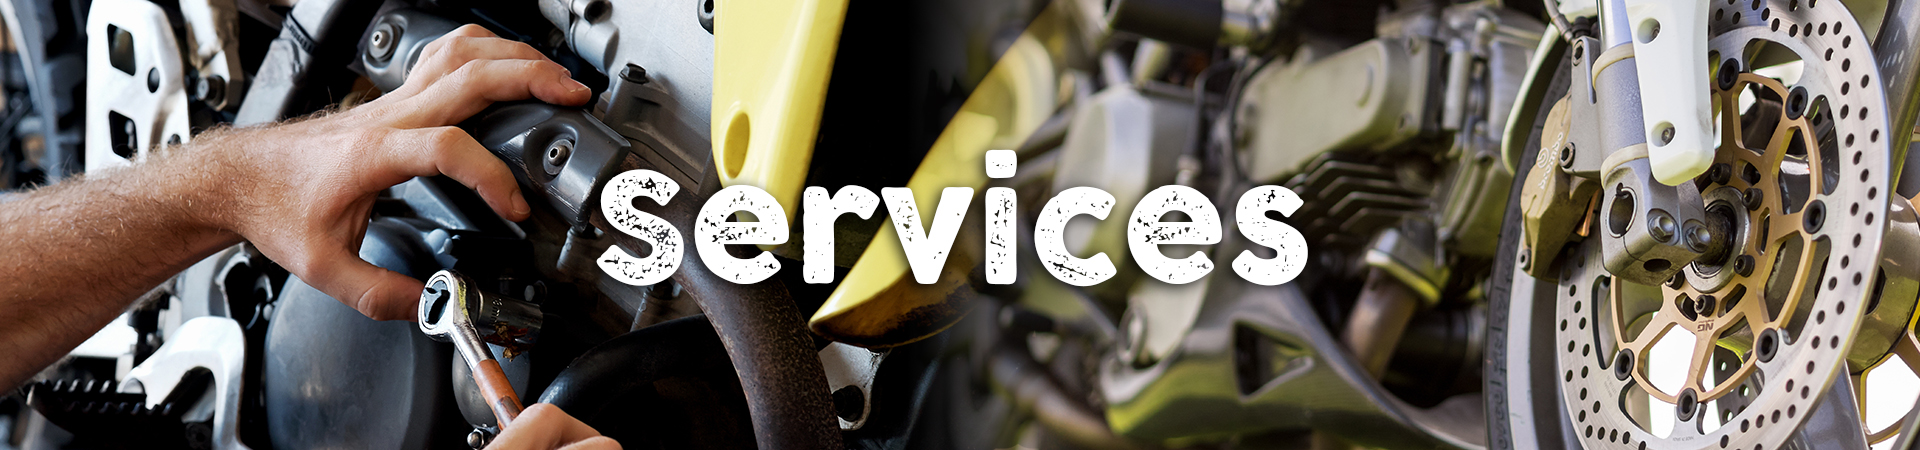 mechanic fixing motocycle engine reno repair services